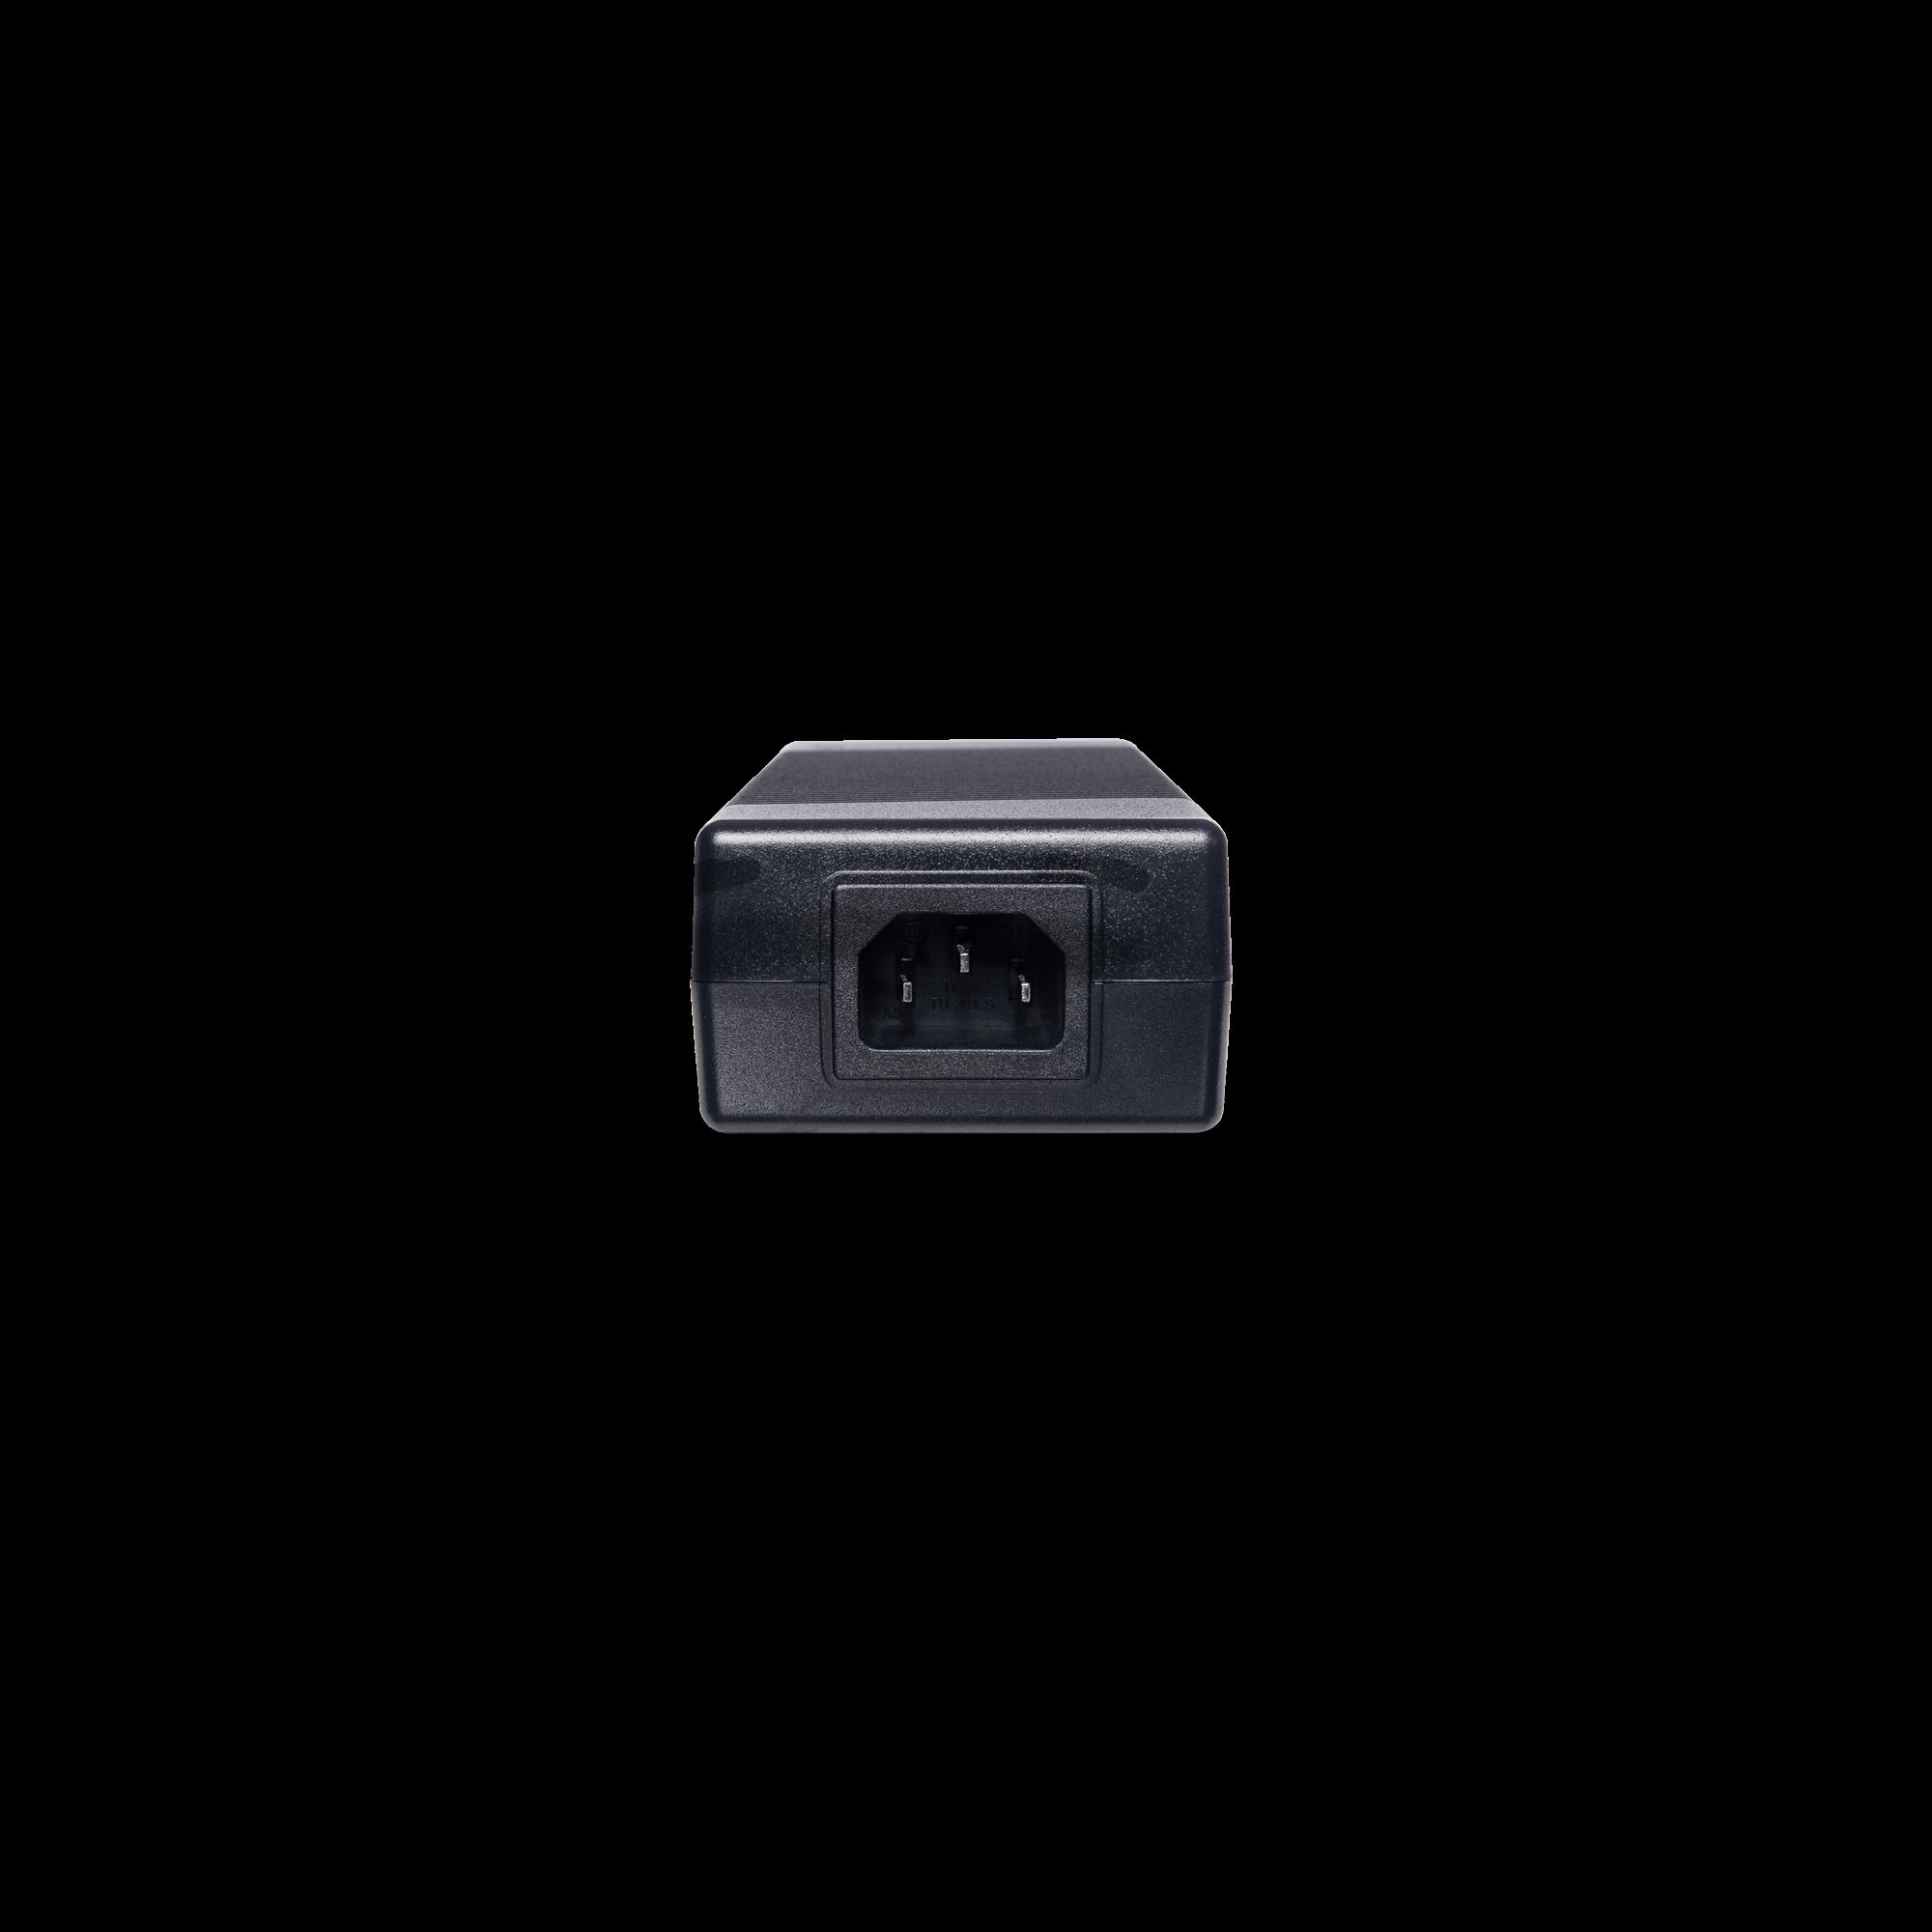 DC56V 120W power adapter